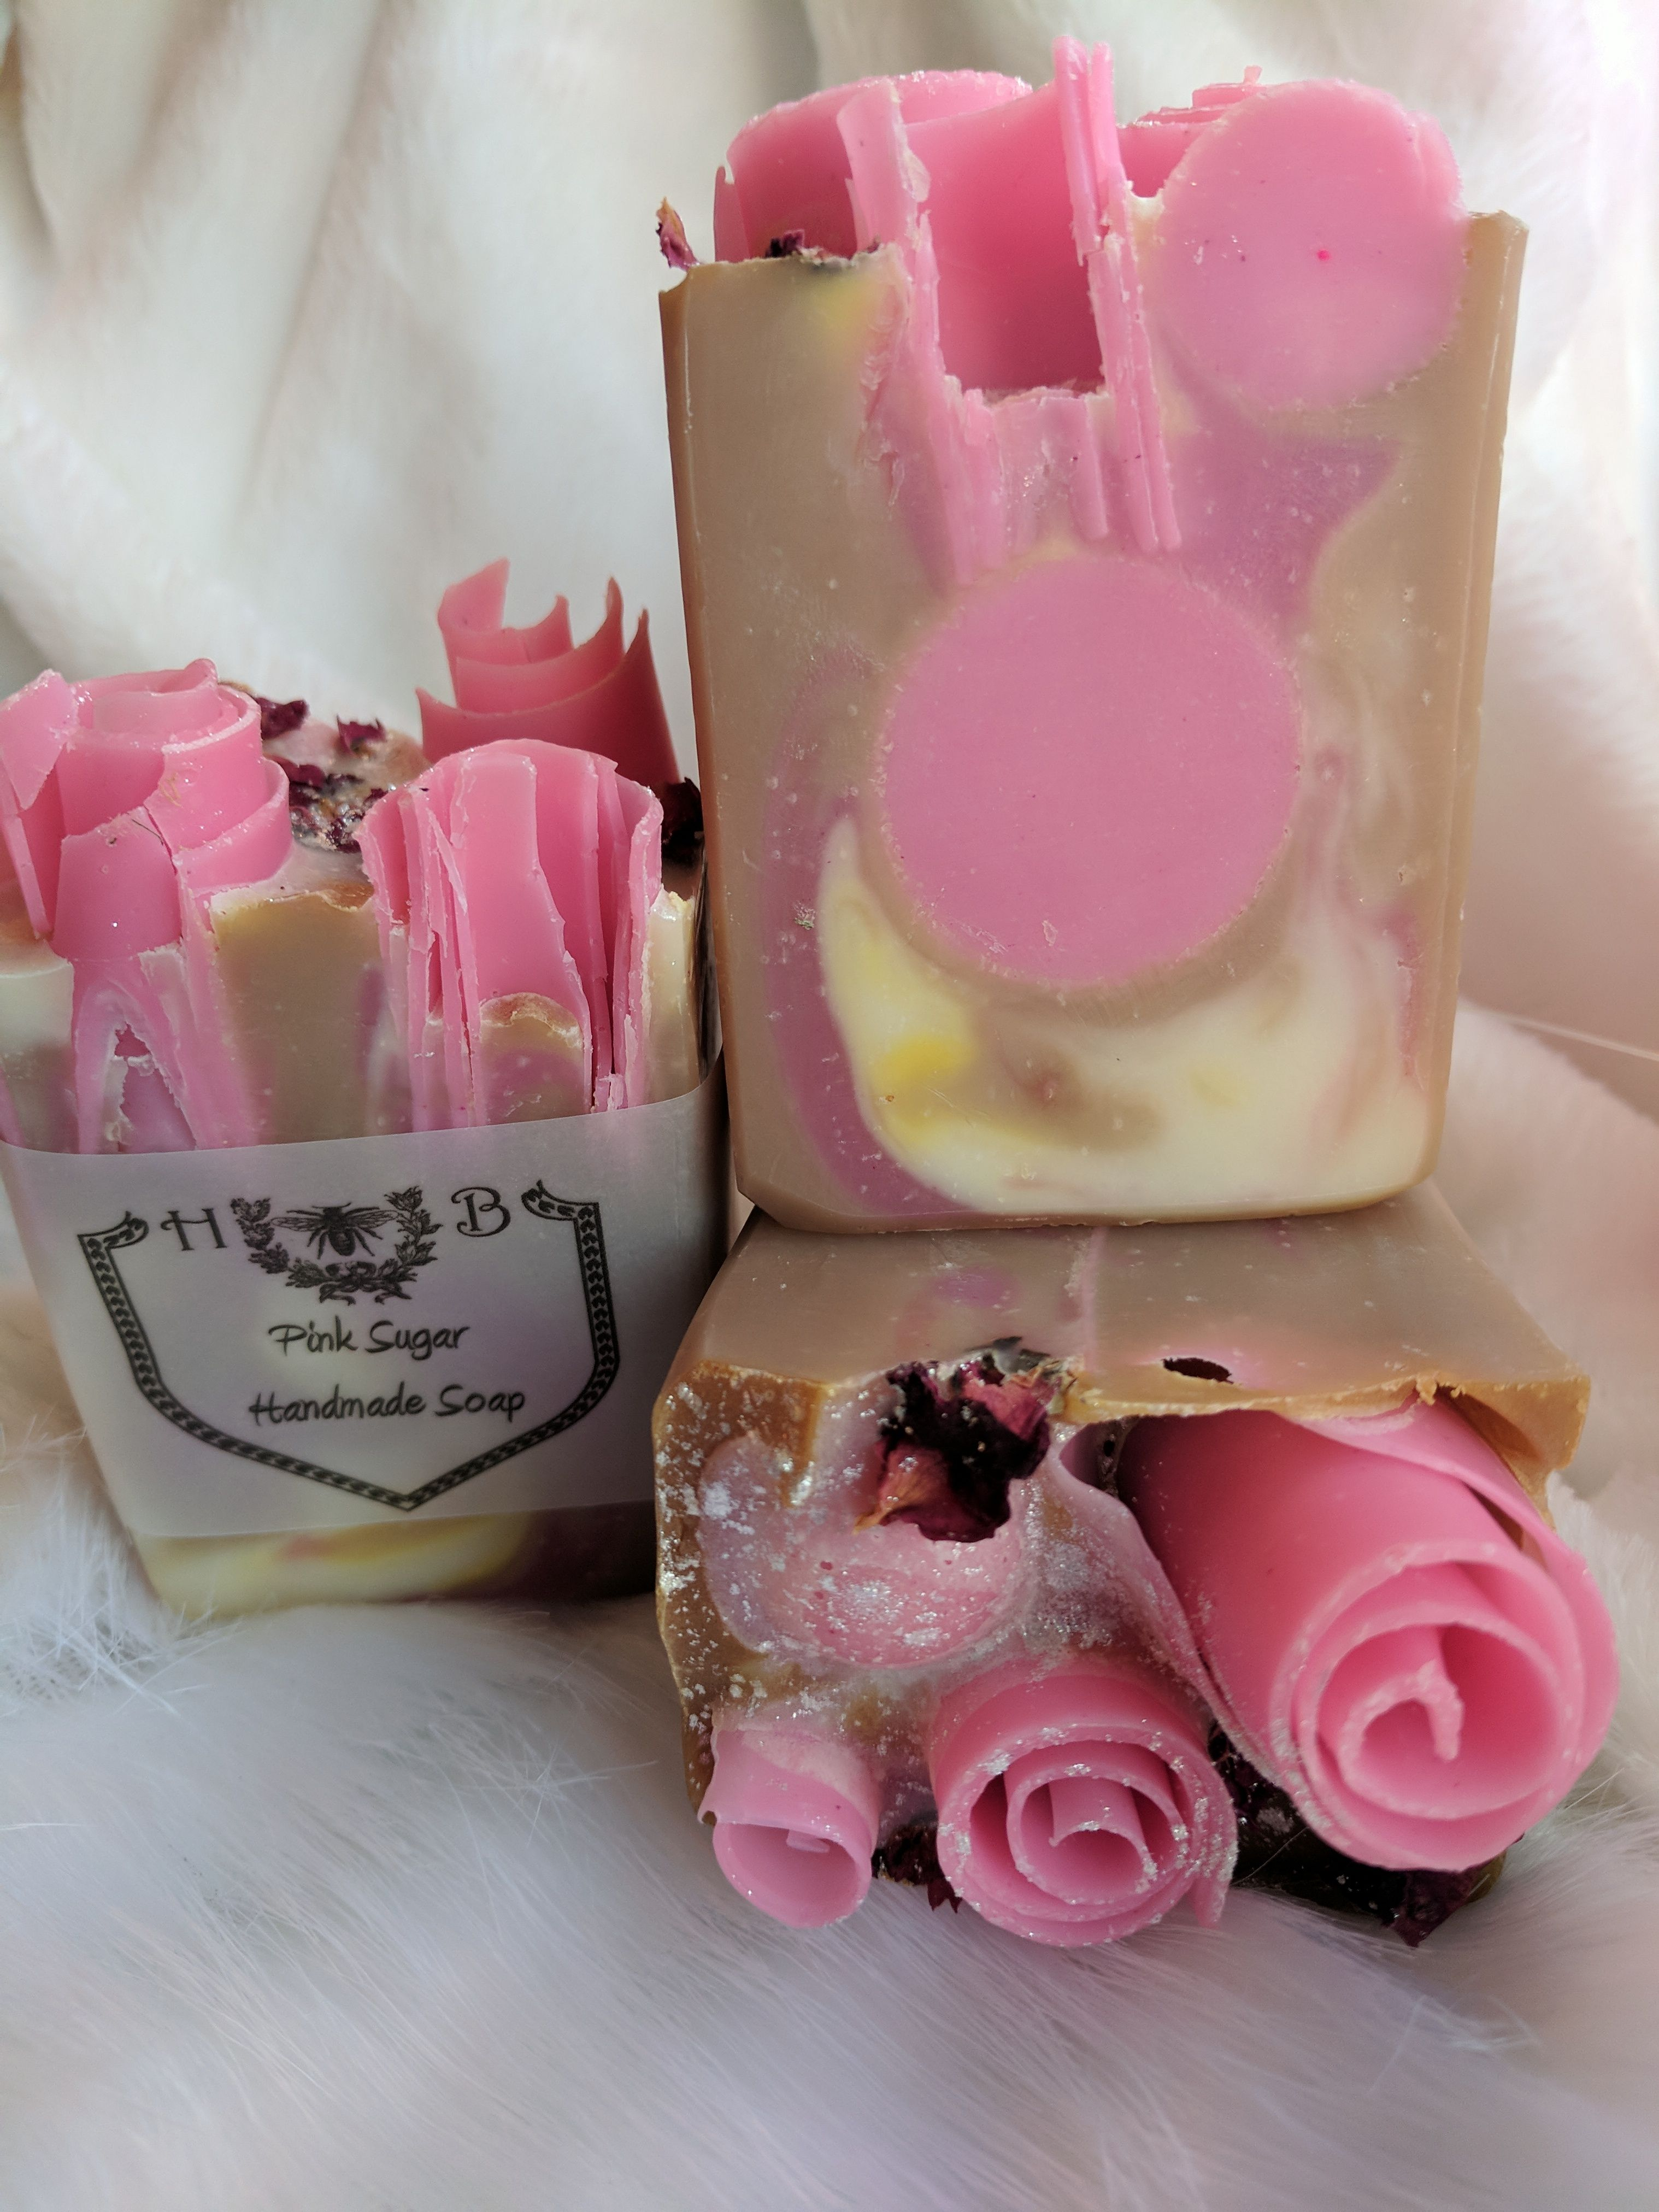 Soap Curls | Soapi\'Bombs | Pinterest | Handmade soaps and Homemade soaps